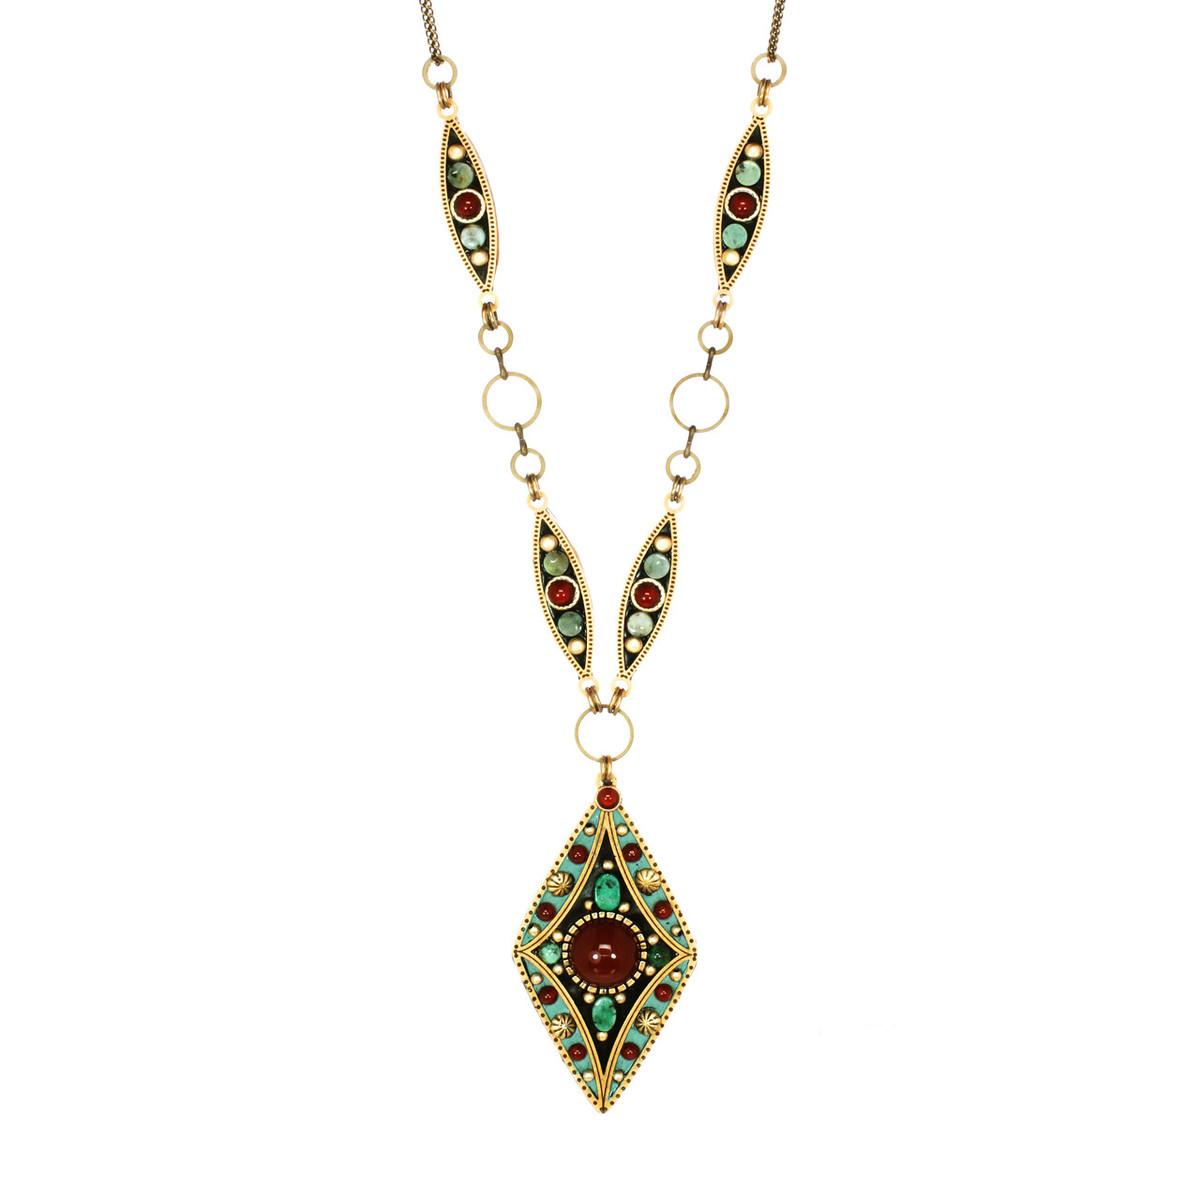 Teal Michal Golan Jewelry Diamond Pendant Necklace